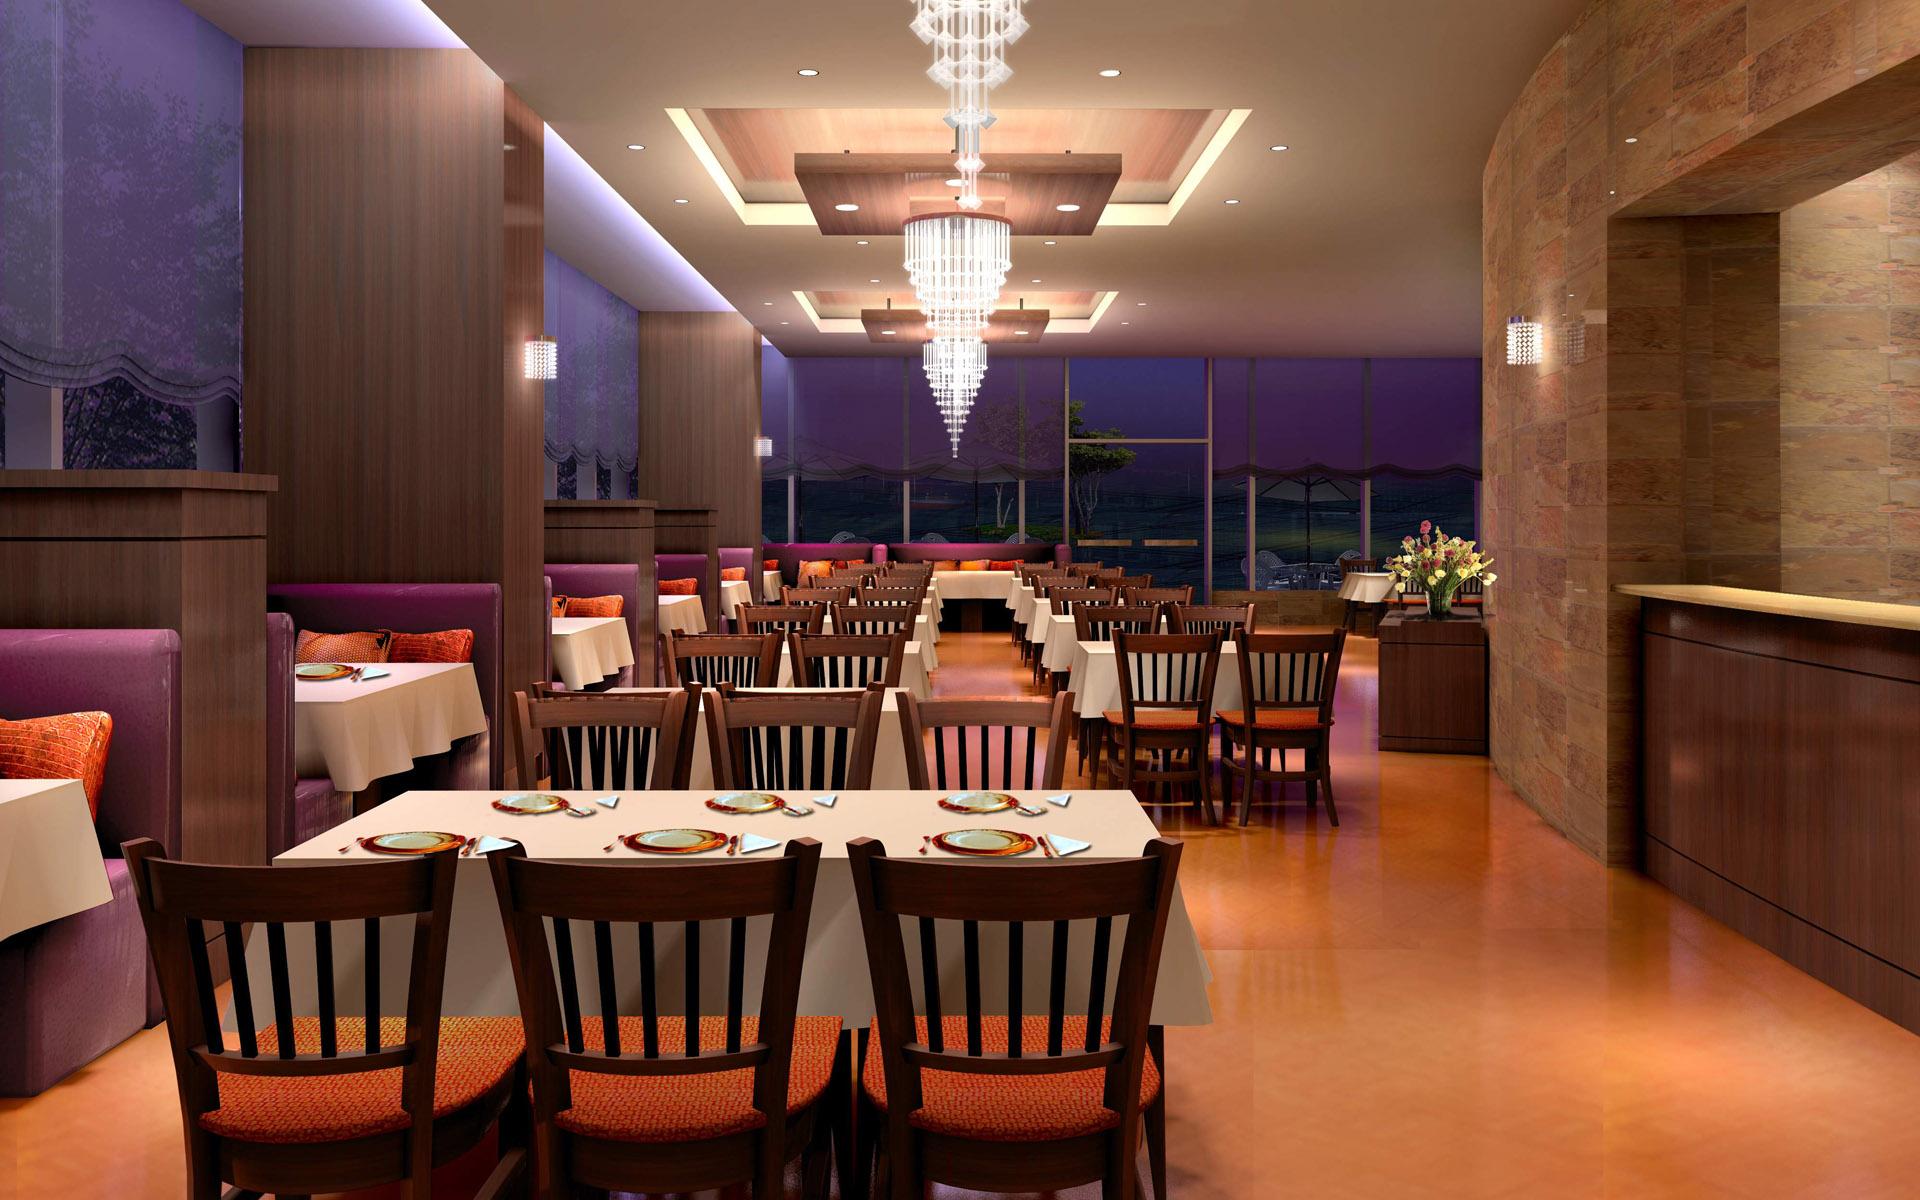 restaurant-interior-design-lighting restaurant interior design lighting